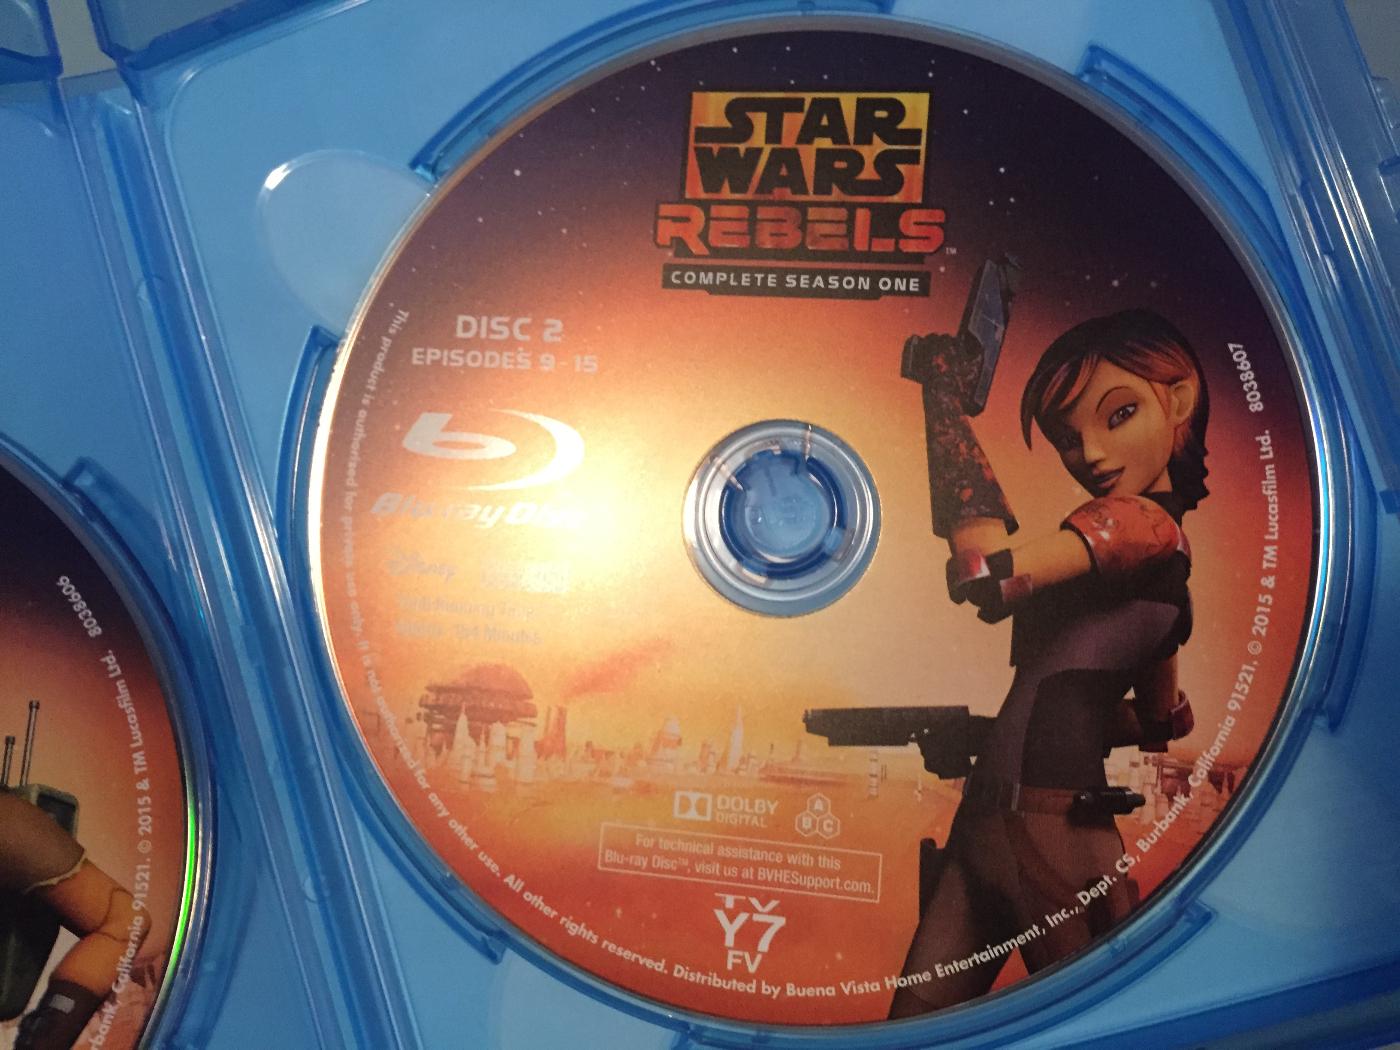 Star-Wars-Rebels-Blu-ray-Disc-2.jpg?resize=1400%2C1050